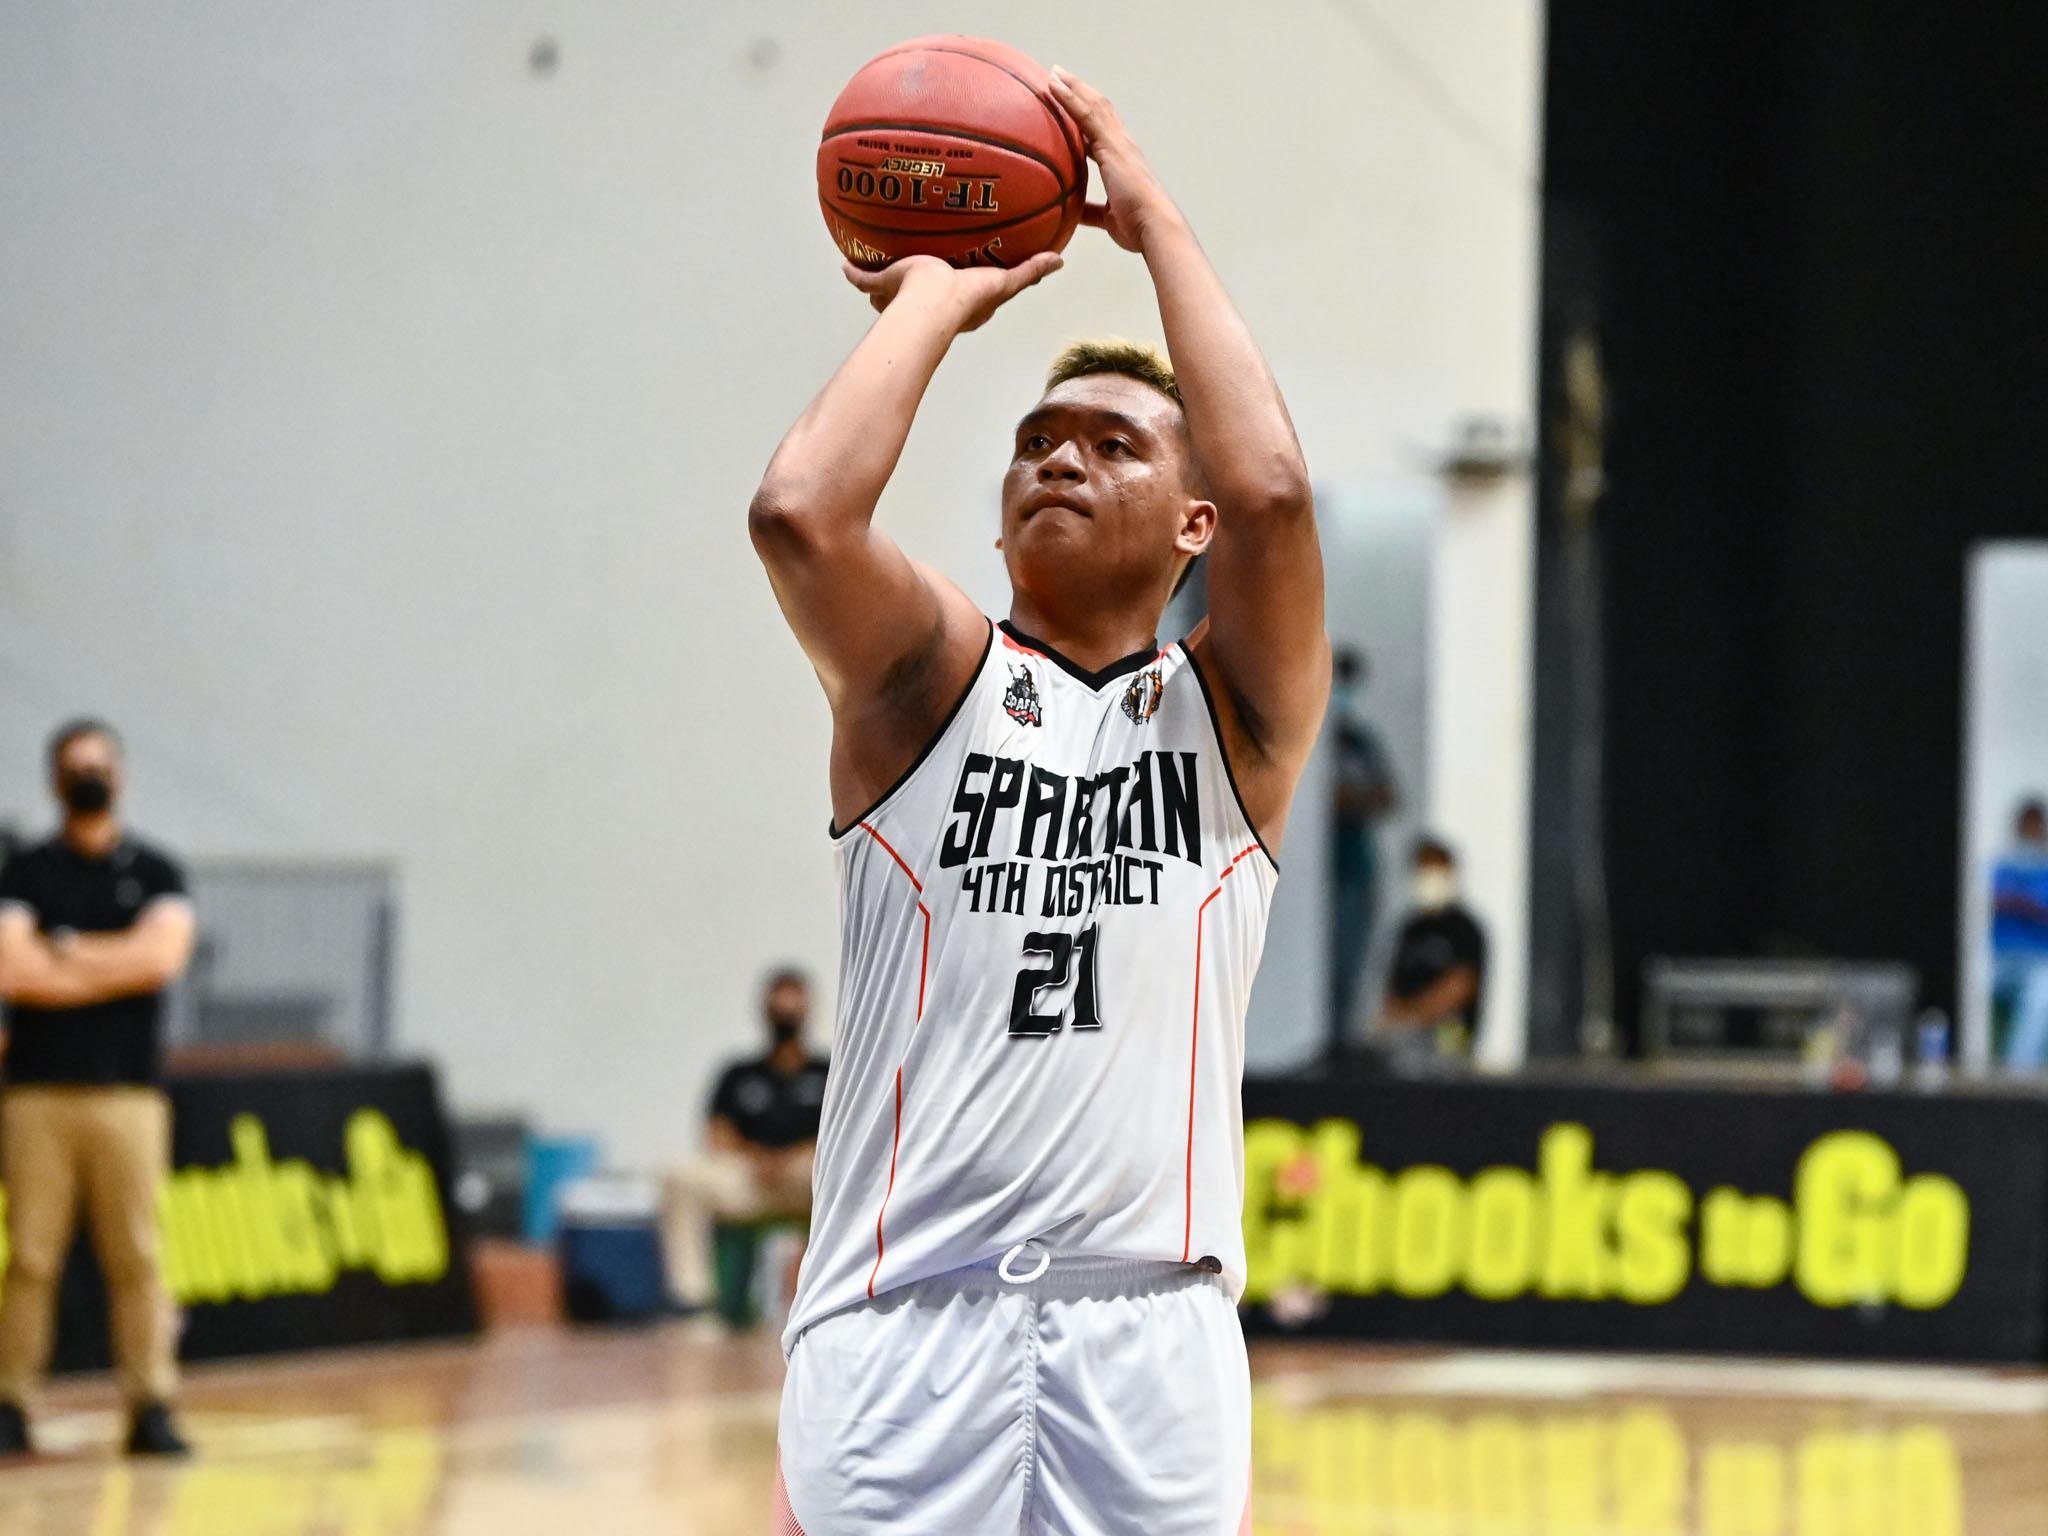 2021-Chooks-NBL-Stan-D4-vs-Taguig-Khenth-Guiab Sampurna powers Taguig to successful NBL debut as Stan D4 drops to 0-4 Basketball NBL News  - philippine sports news